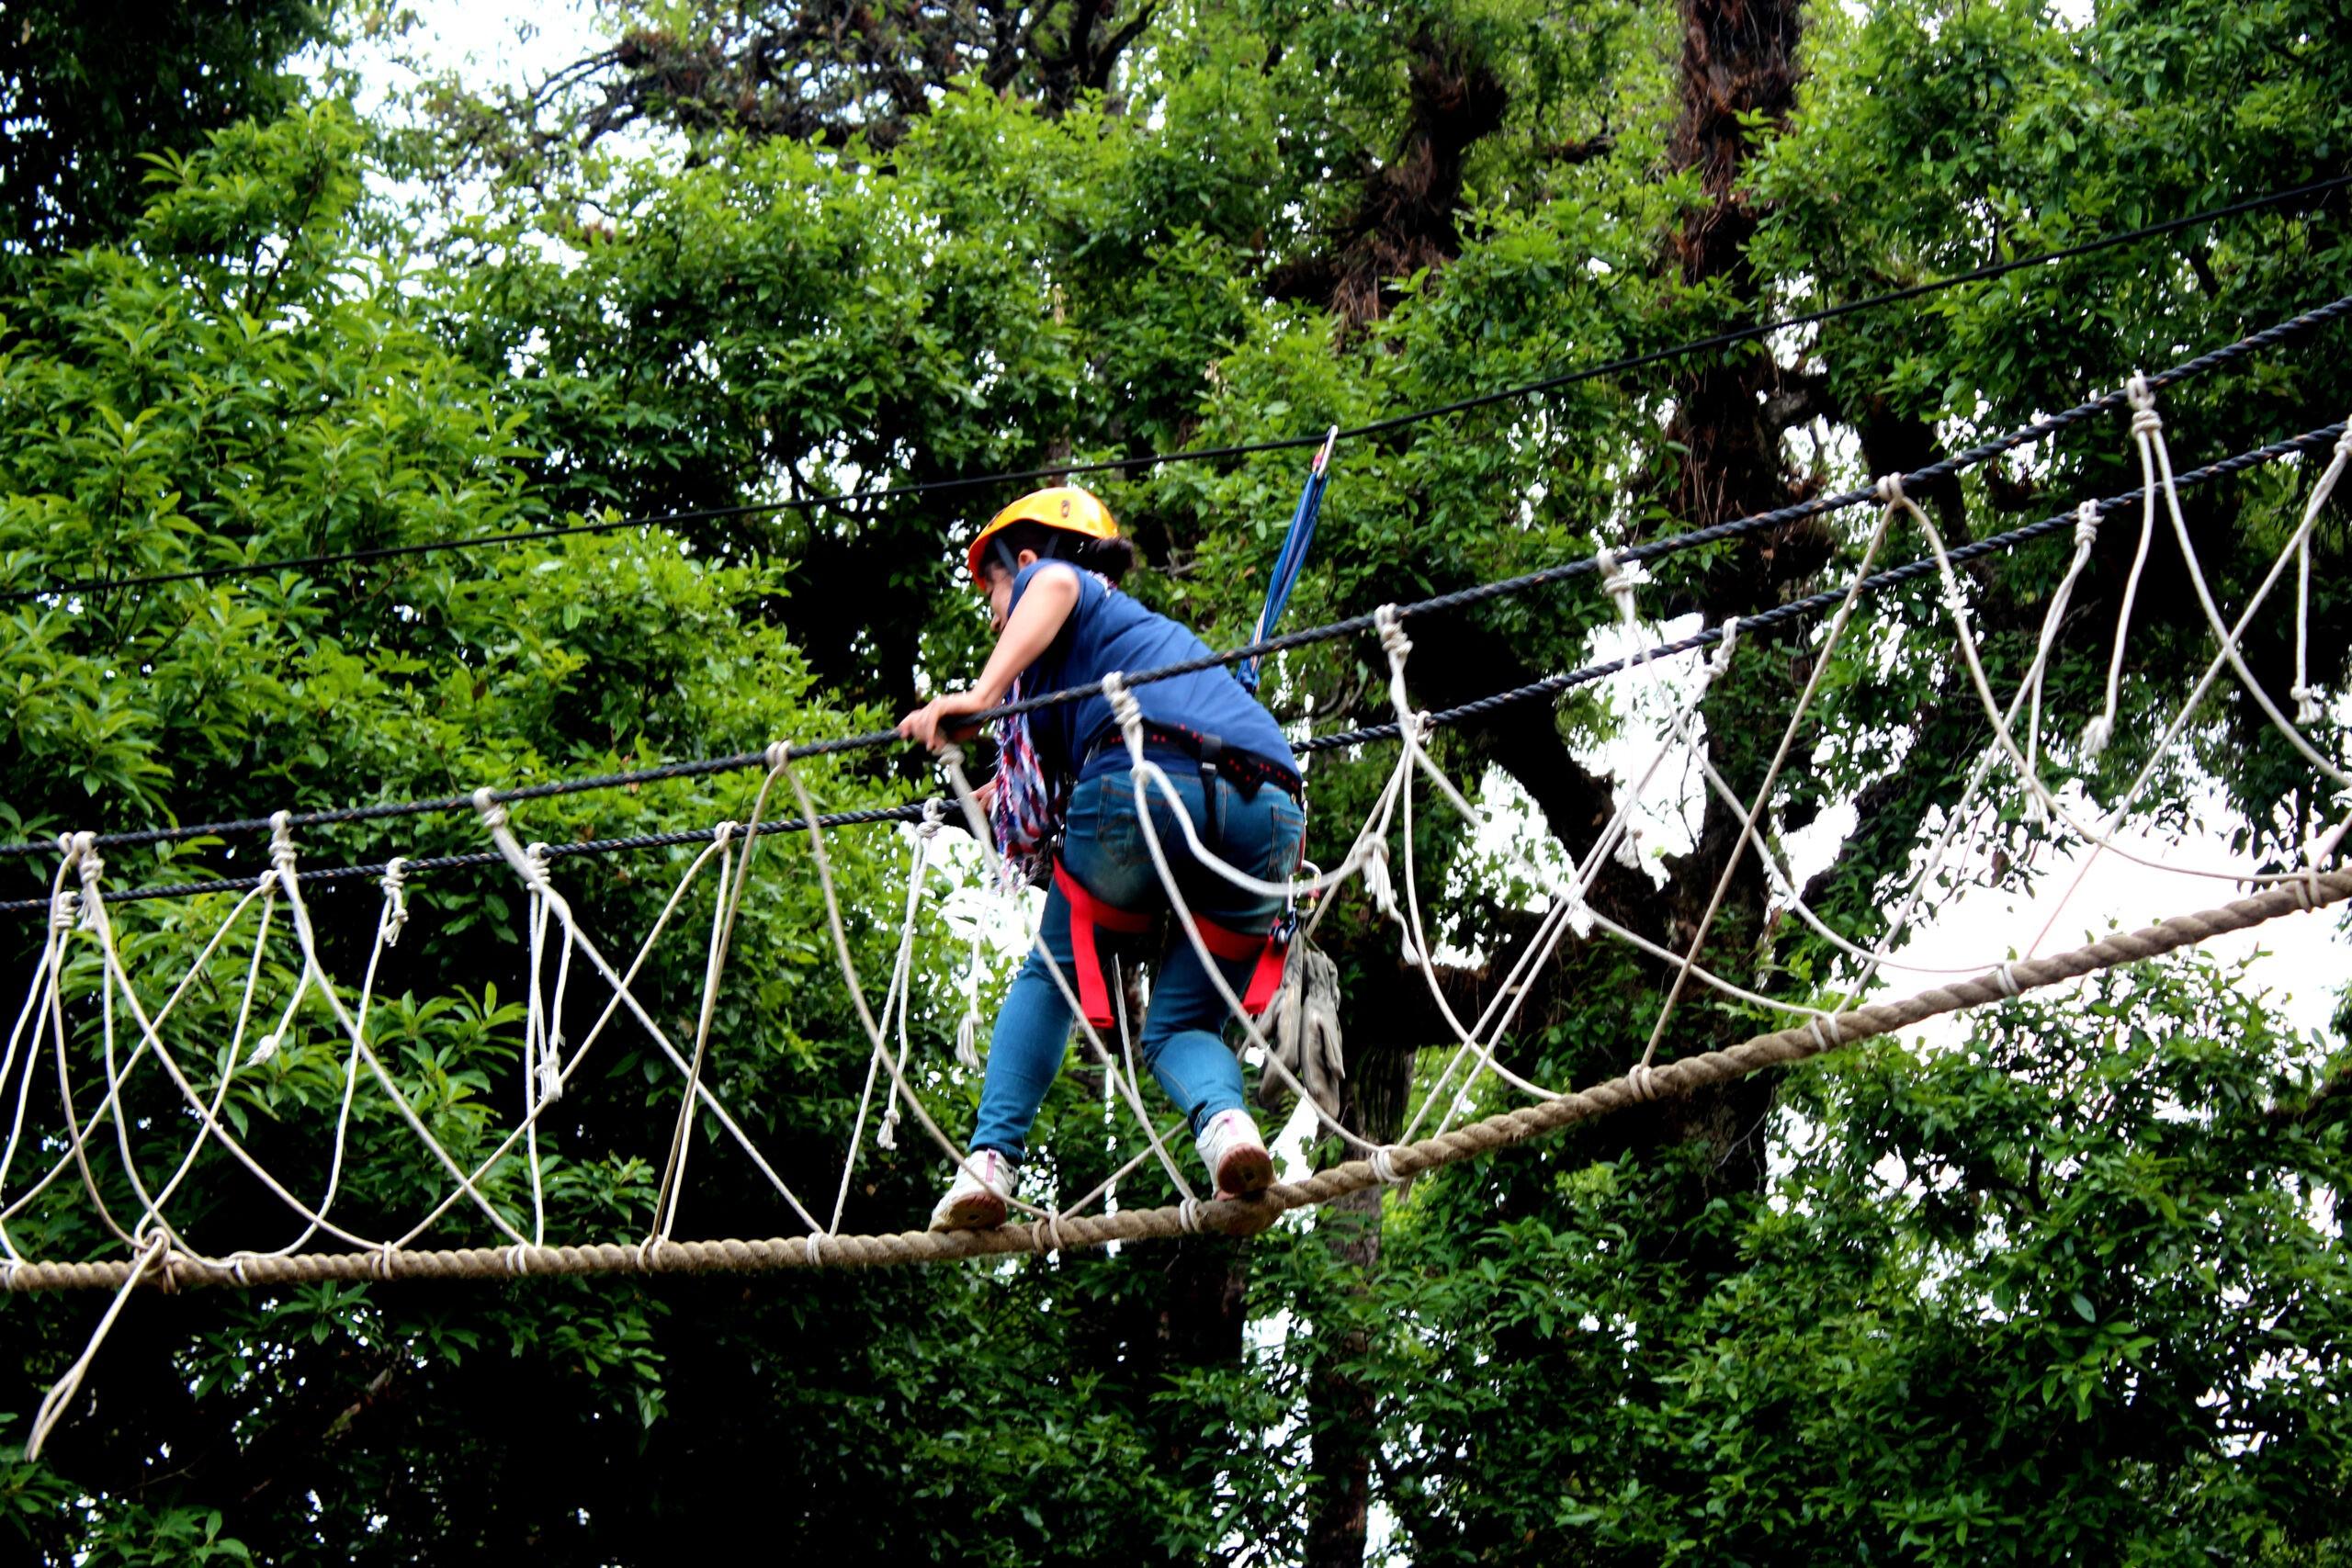 Obstacle activities in Magpie chopta - A girl crossing a burma bridge in Chopta